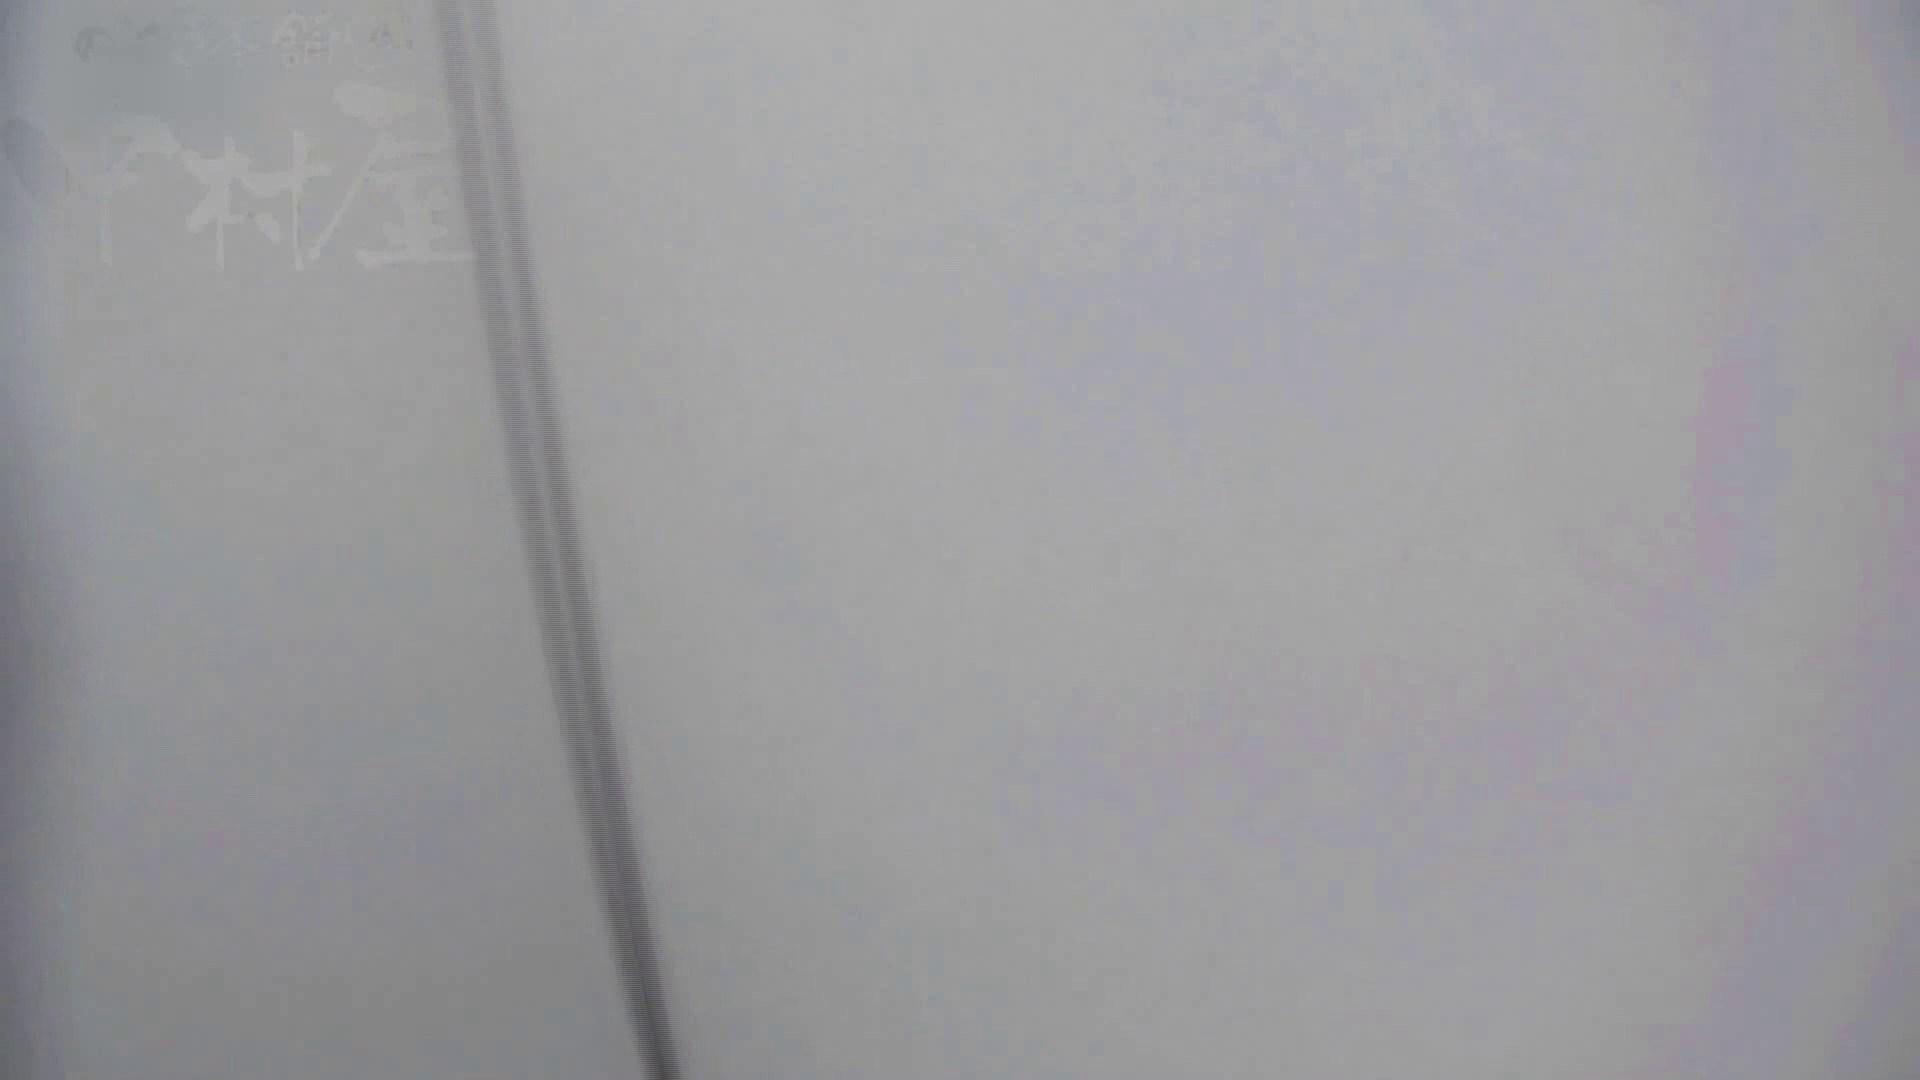 美しい日本の未来 No.17 番外編 ※※※閲覧注意※※※ 盗撮 盗撮動画紹介 105画像 50